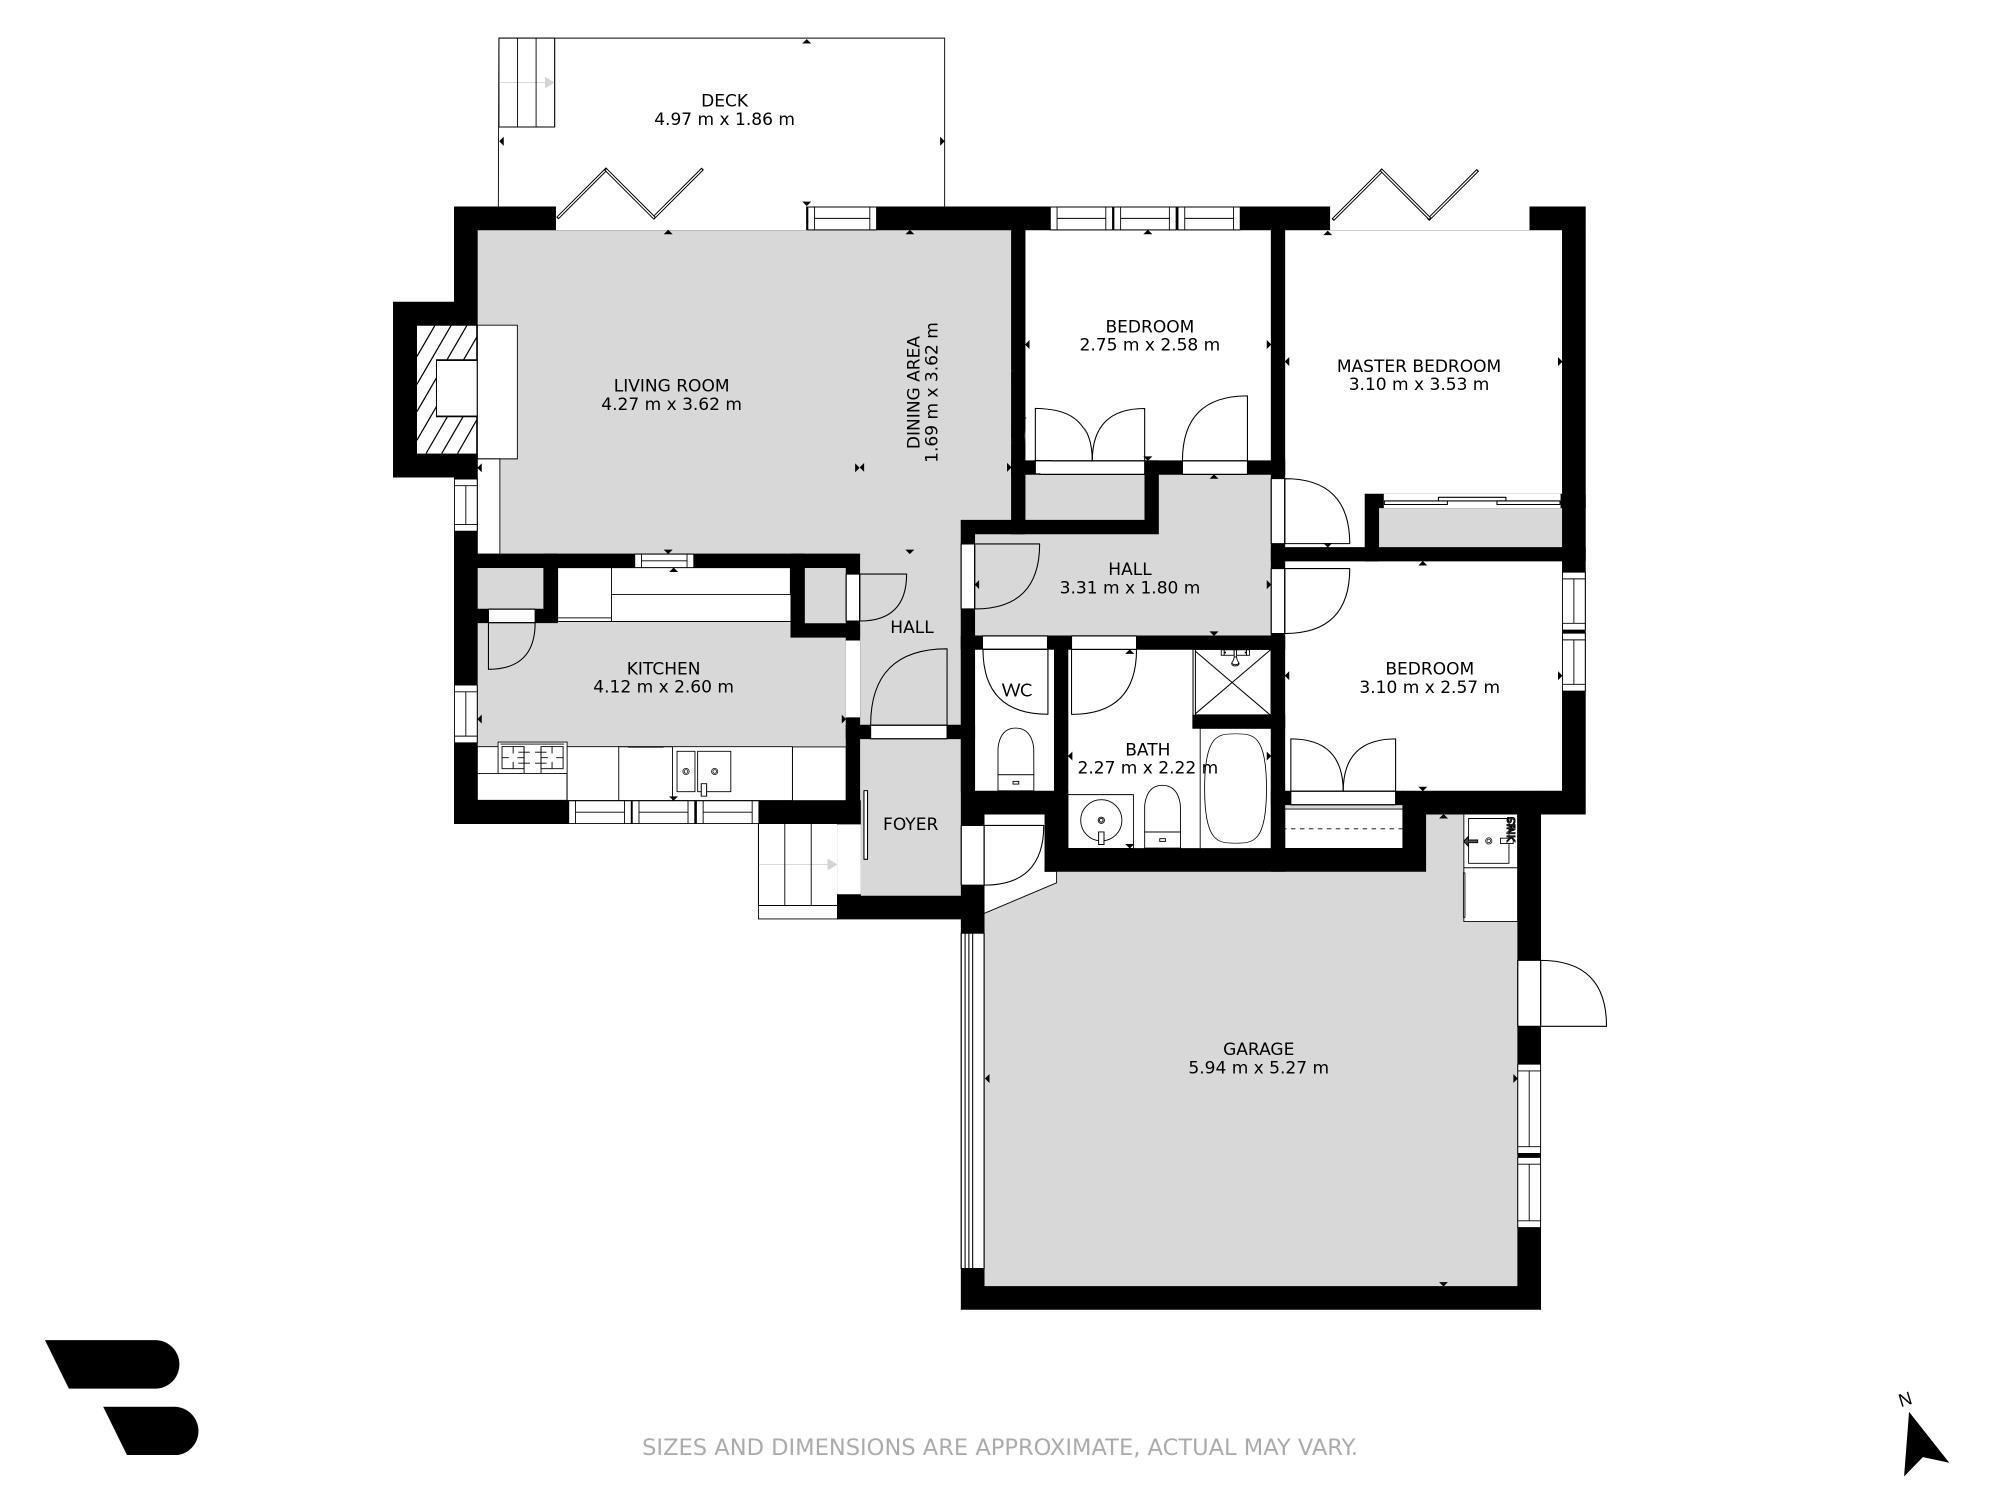 65 Gibraltar Street Howickproperty floorplan image